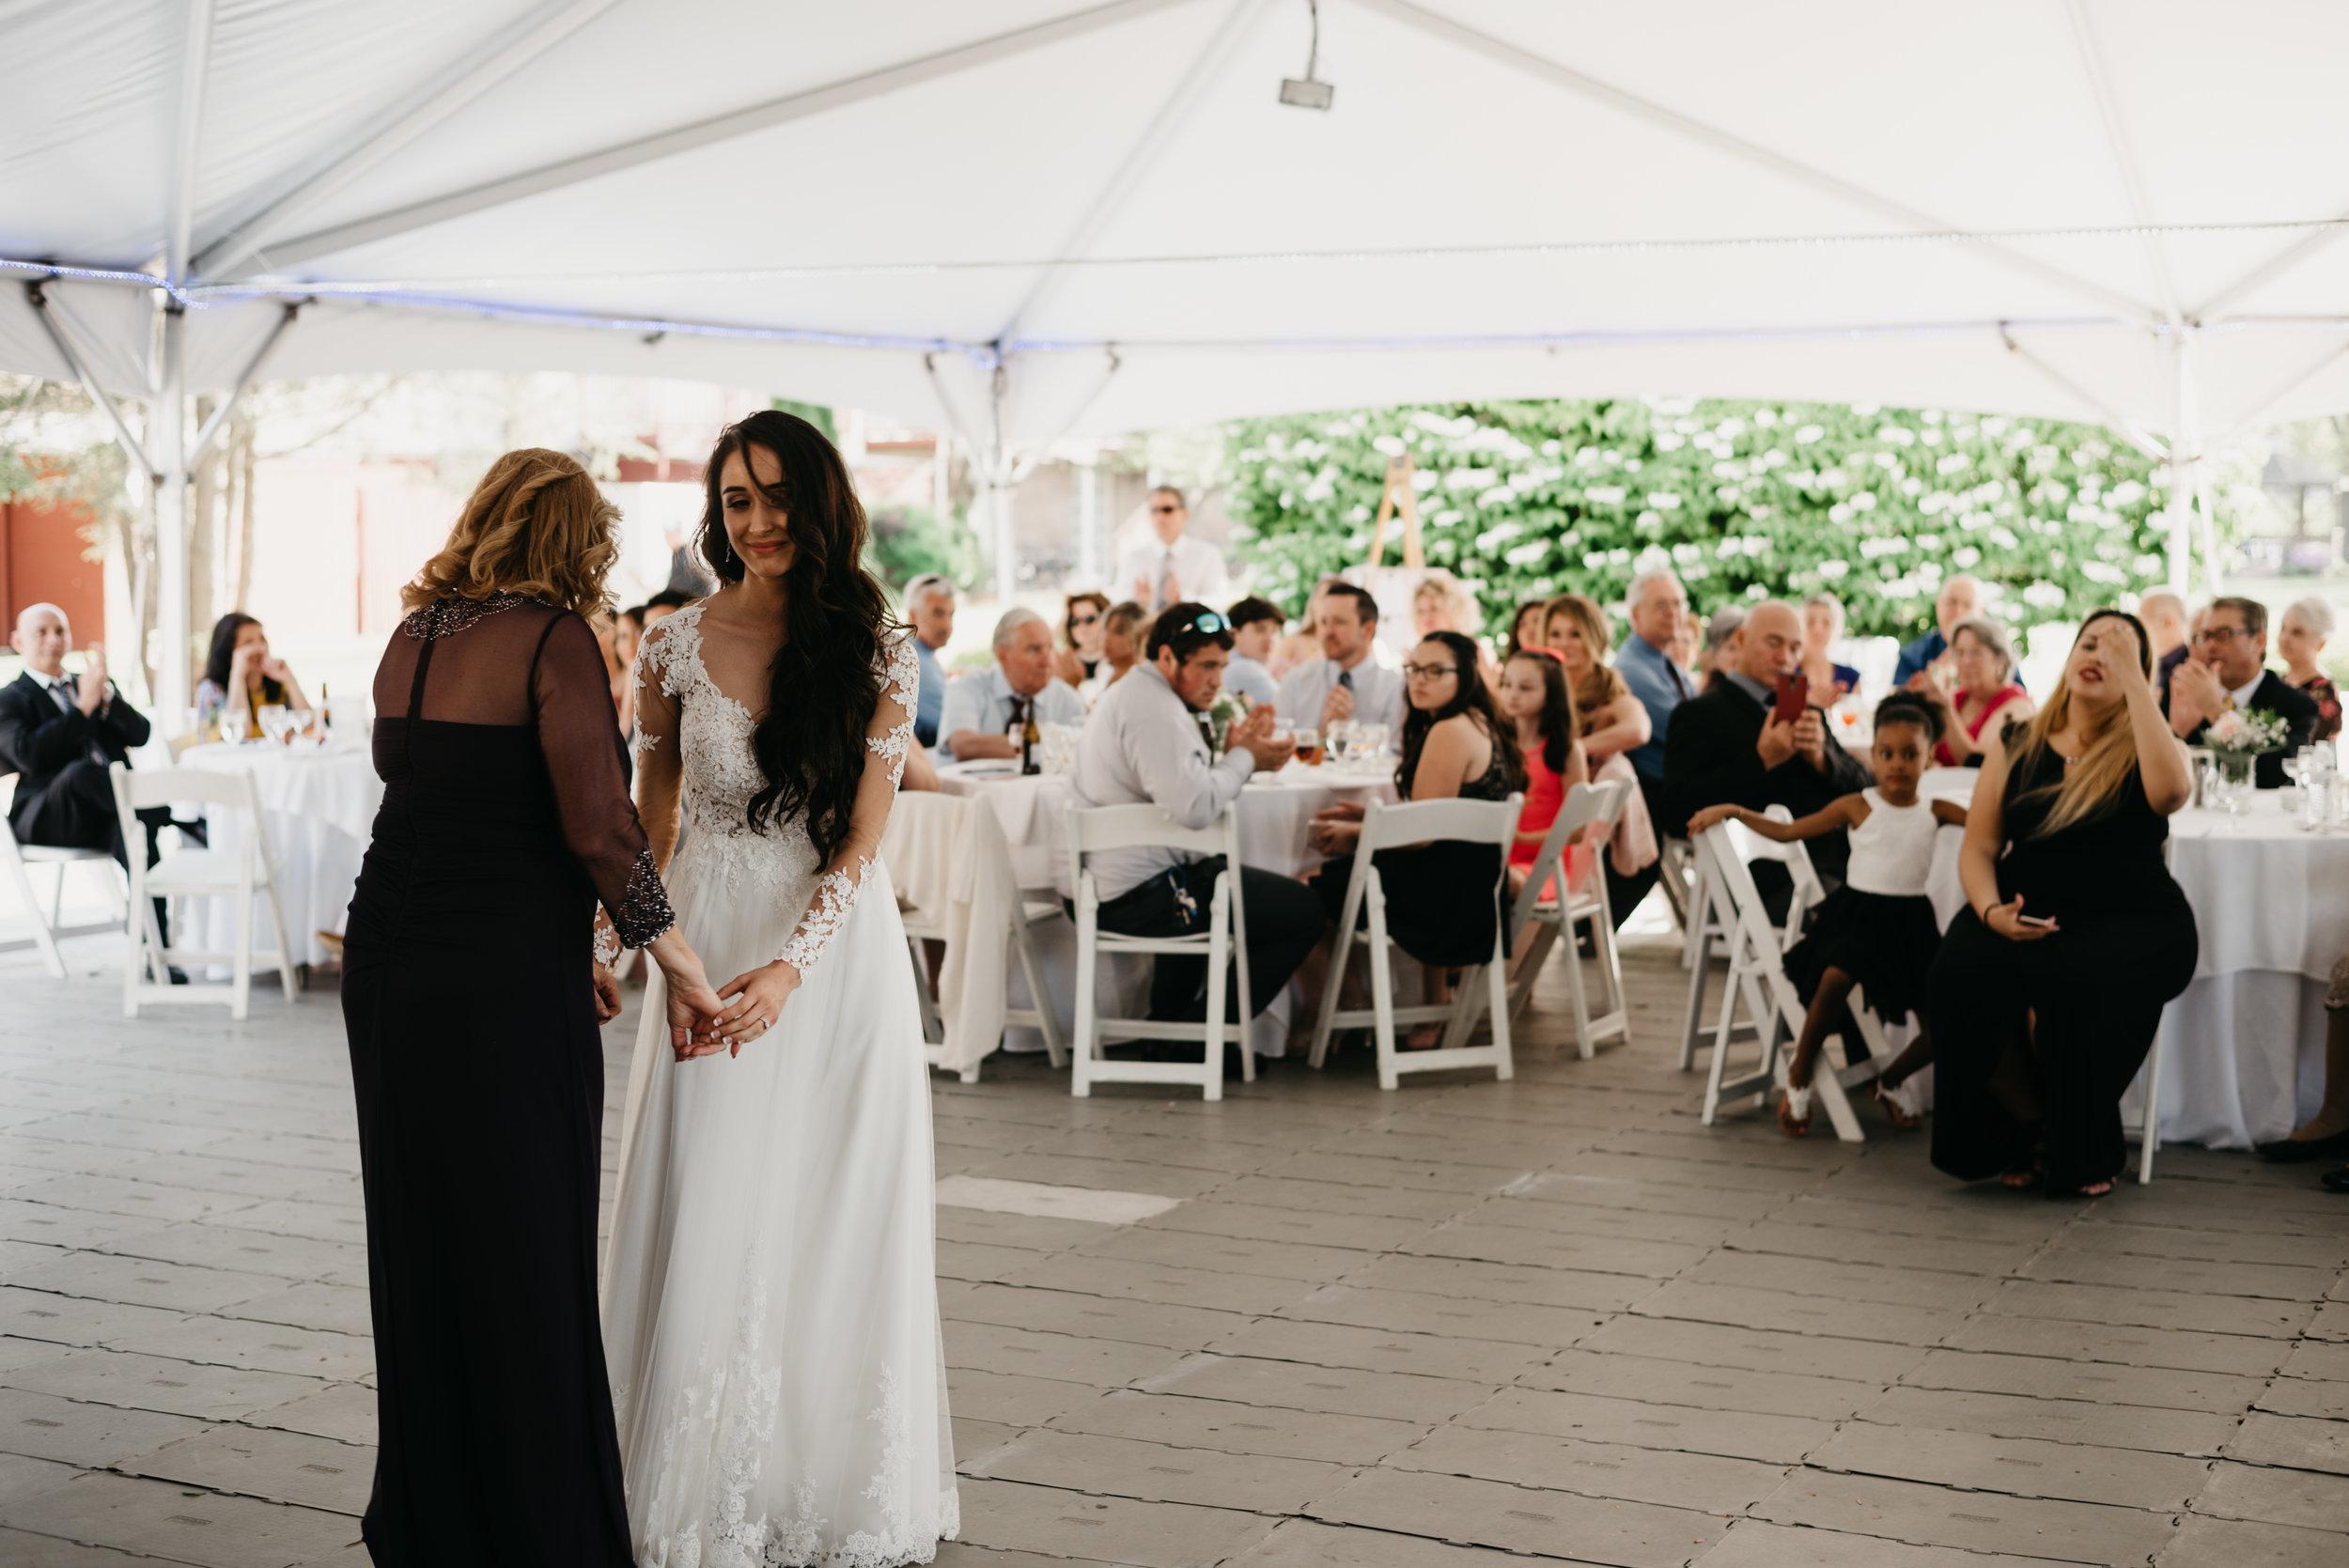 Barch-Massachusetts-Lakeside Tent Wedding-Western Massachusetts Wedding Photographer-02409.jpg